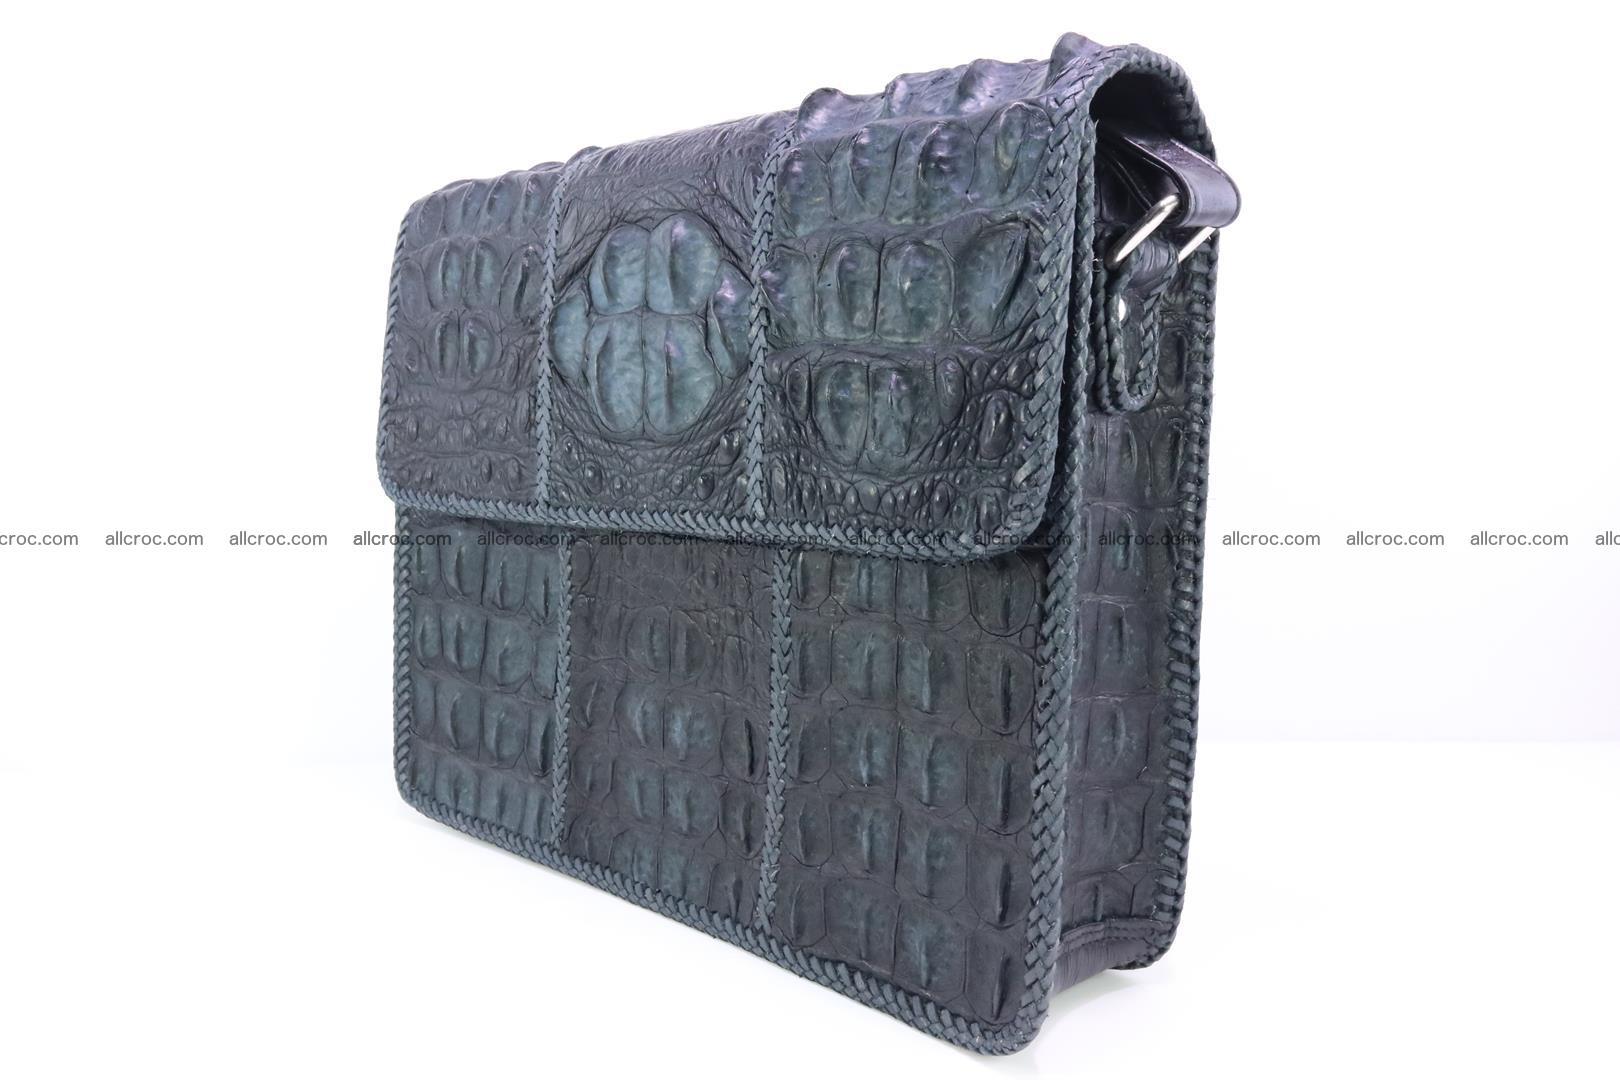 Crocodile skin shoulder bag with braided edges 146 Foto 3